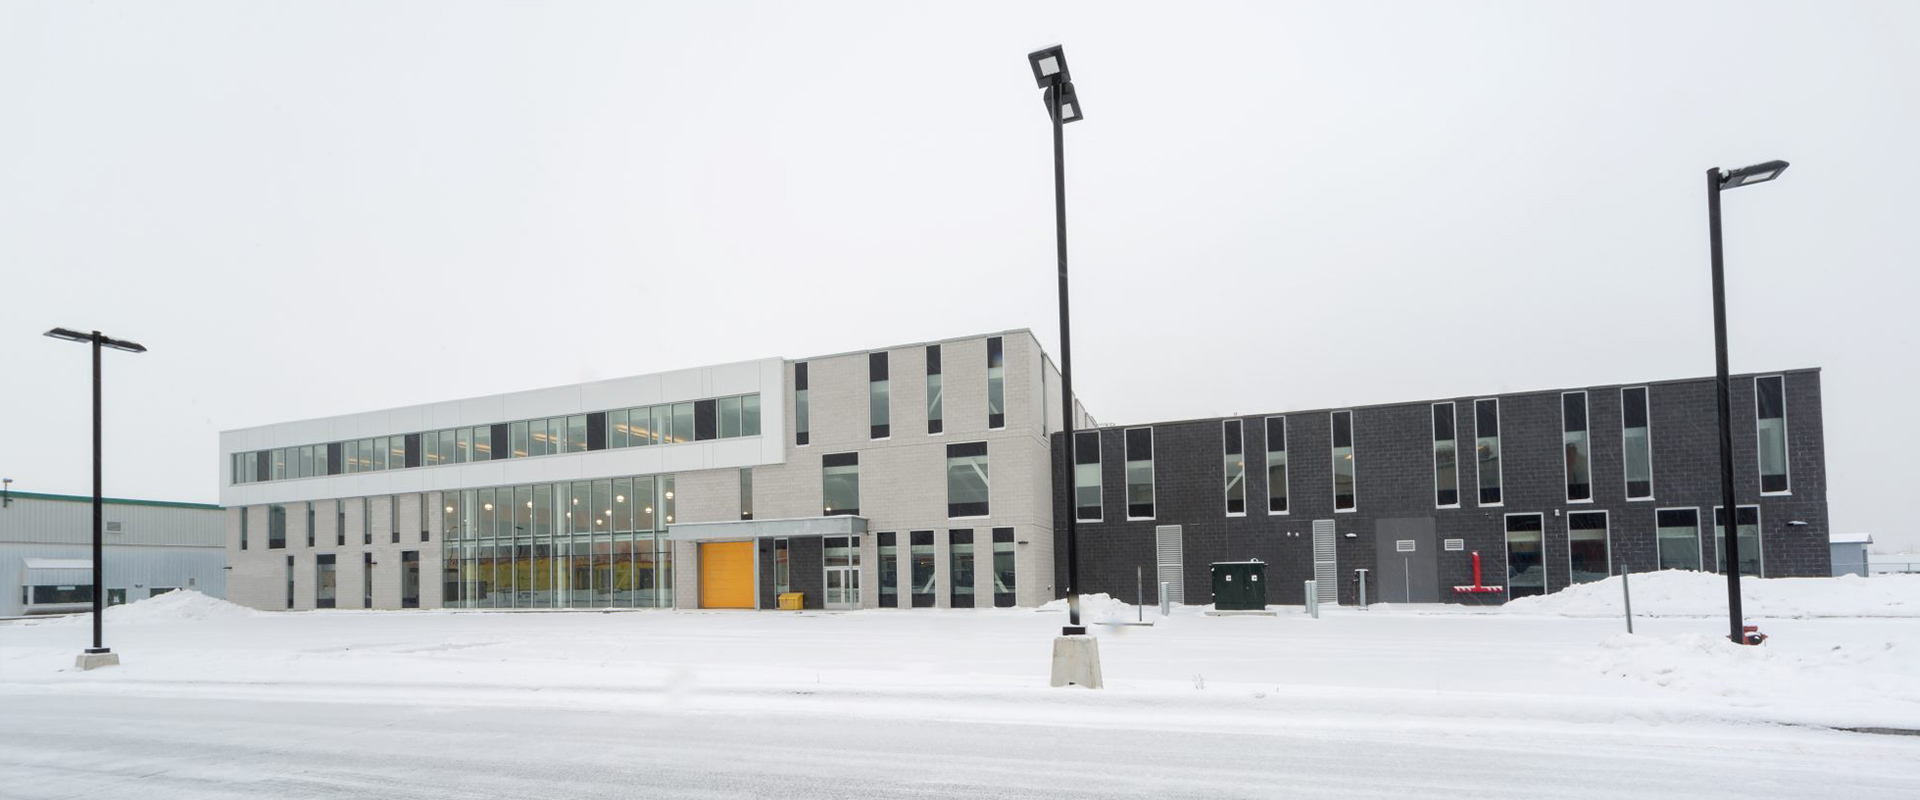 Armoury Building M-196 Saint-Hubert Garrison